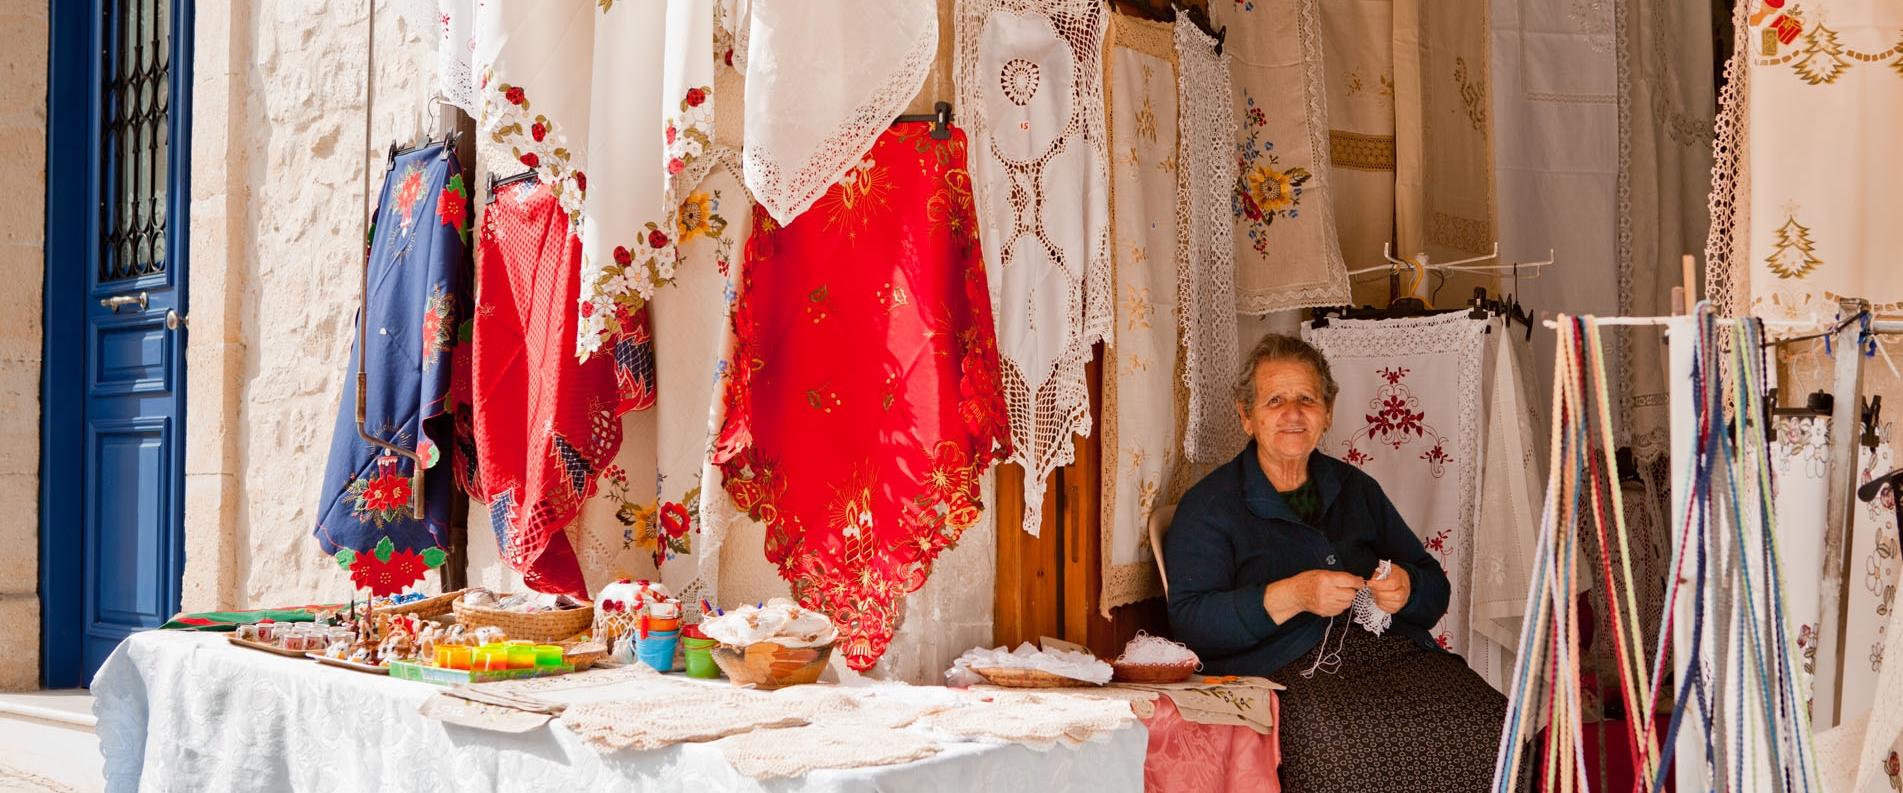 Деревня Омодос в Троодосе, фоторепортаж